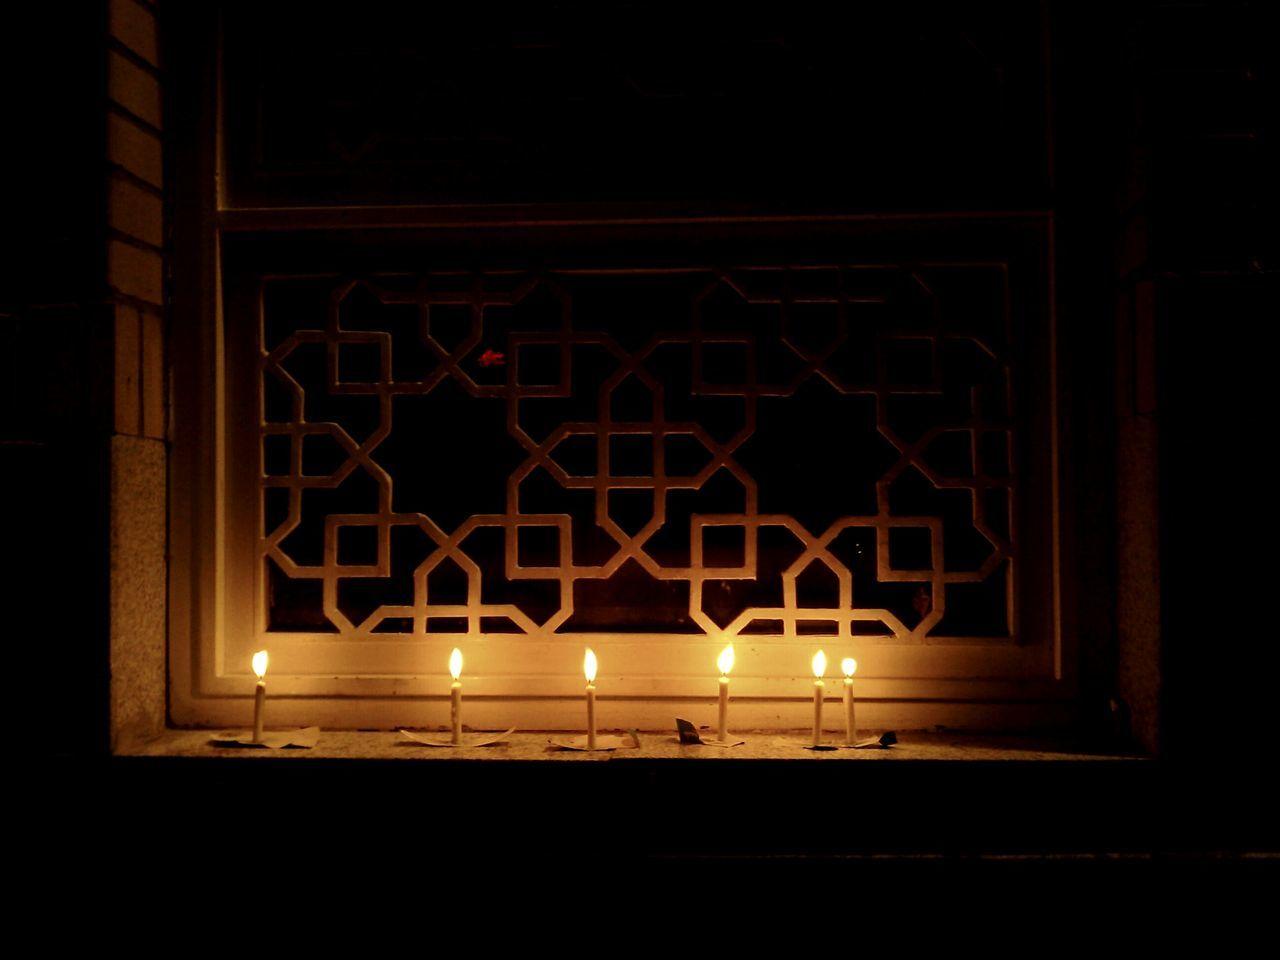 Altars Candles Candle Ashoura Moharram 10thMoharram Qom Iran Holyshrine محرم شام غریبان عاشورا